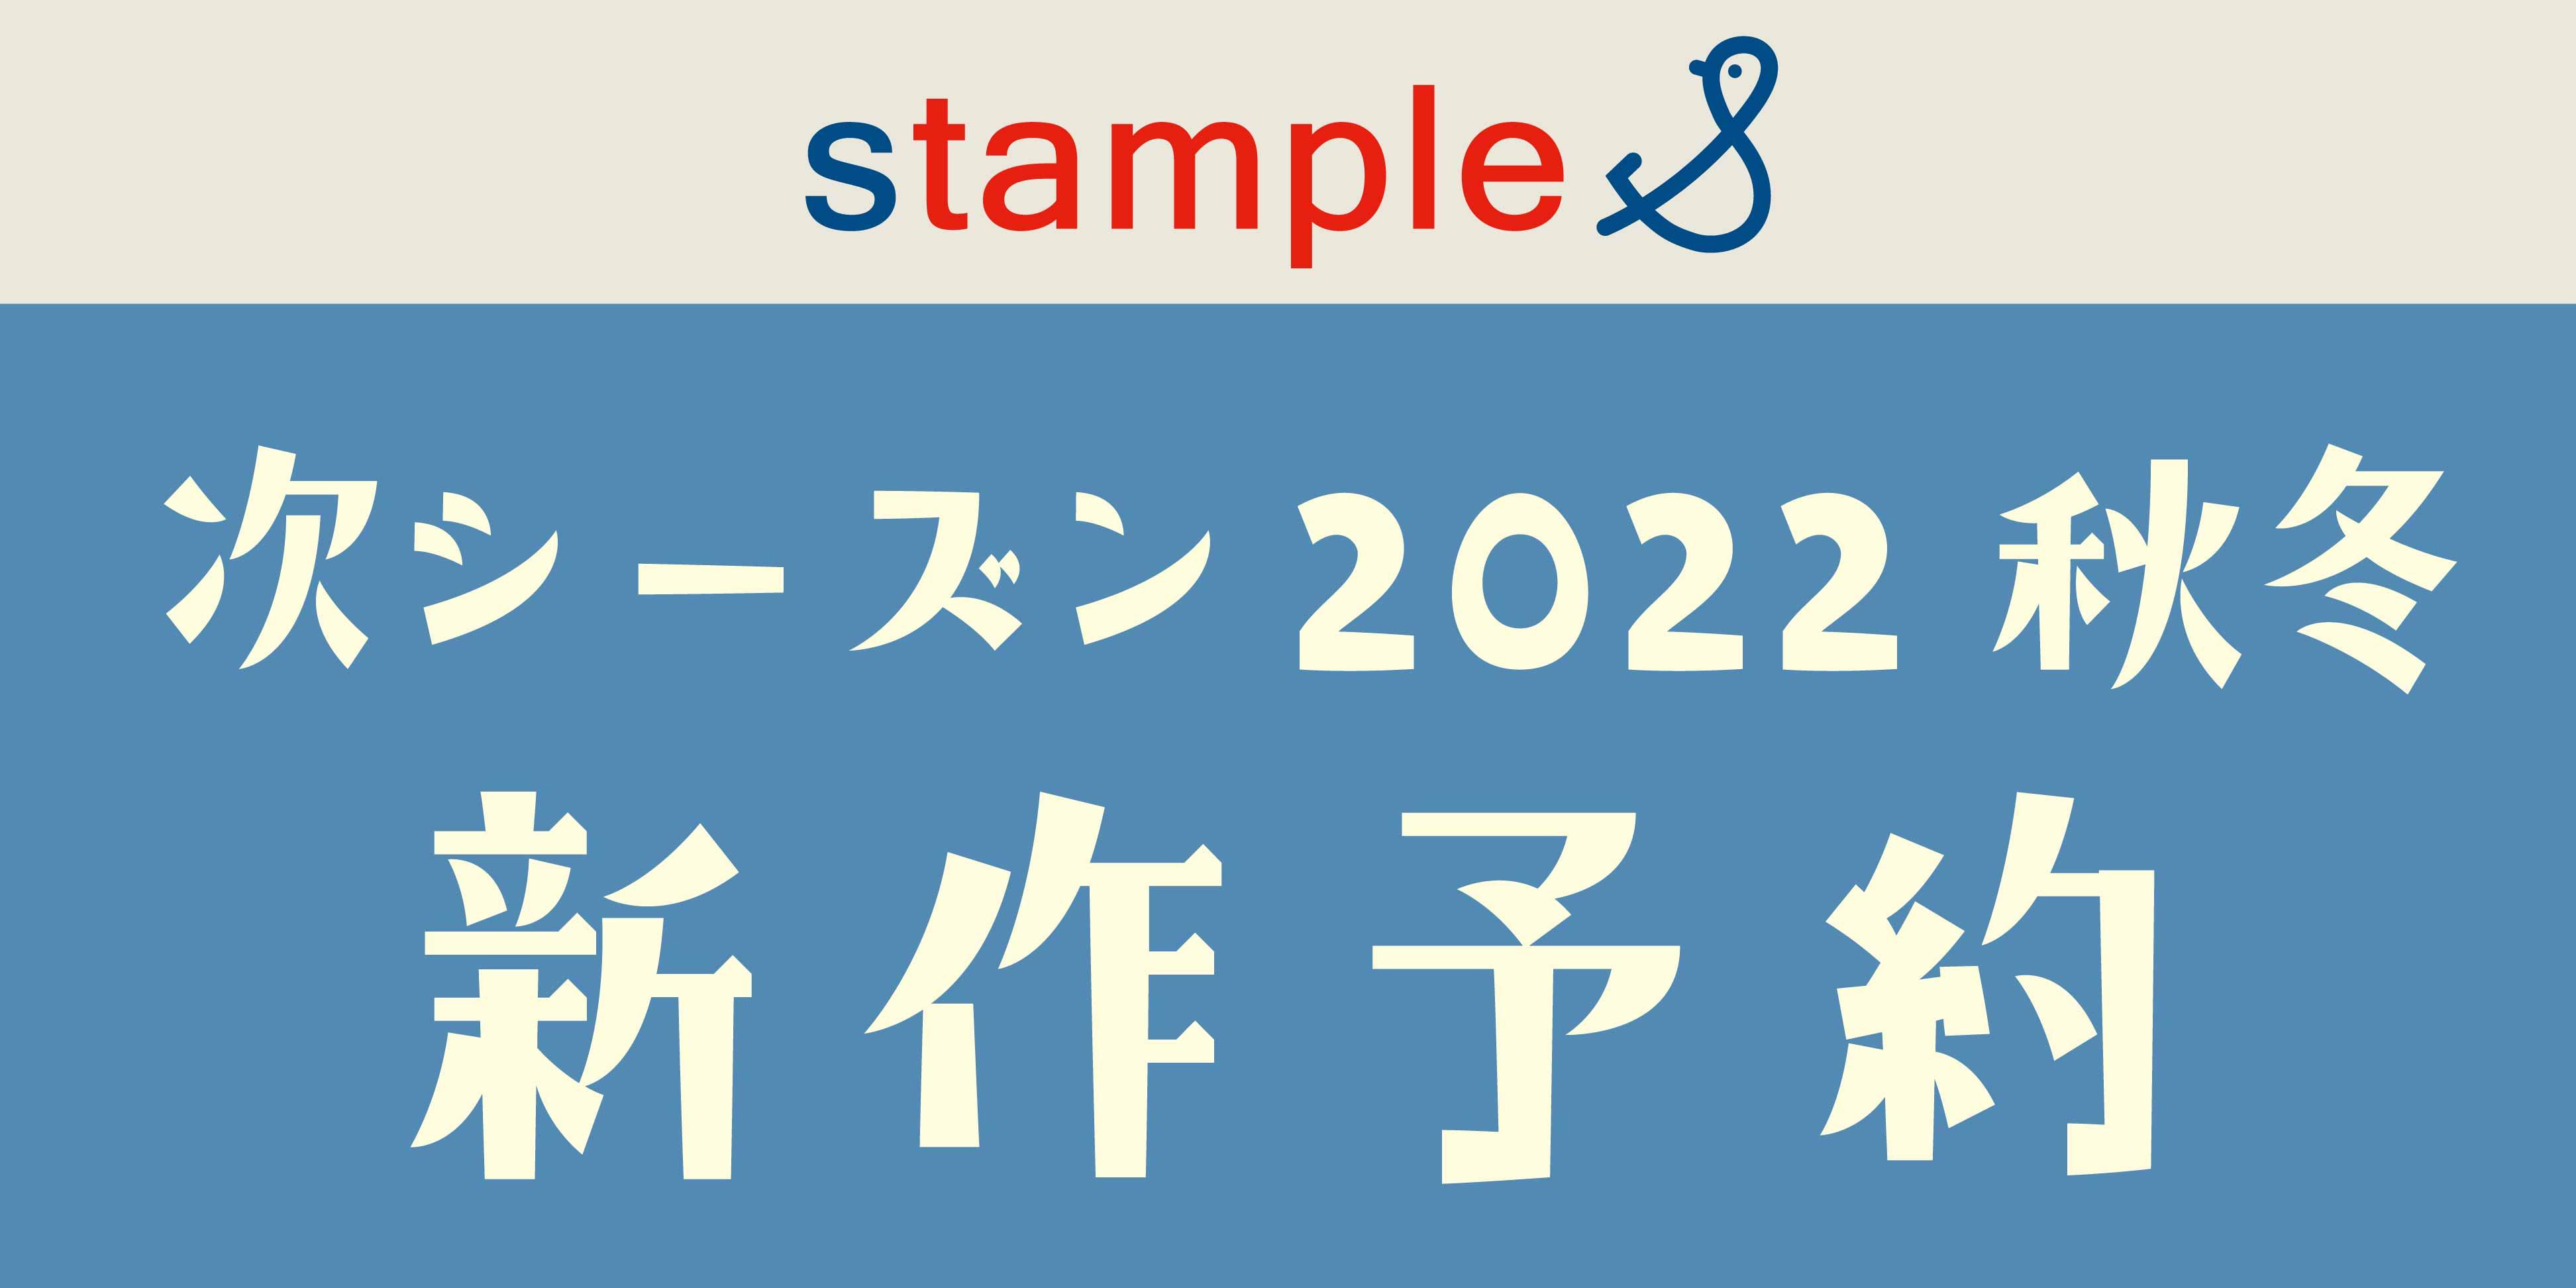 stample:2021秋冬 新作予約